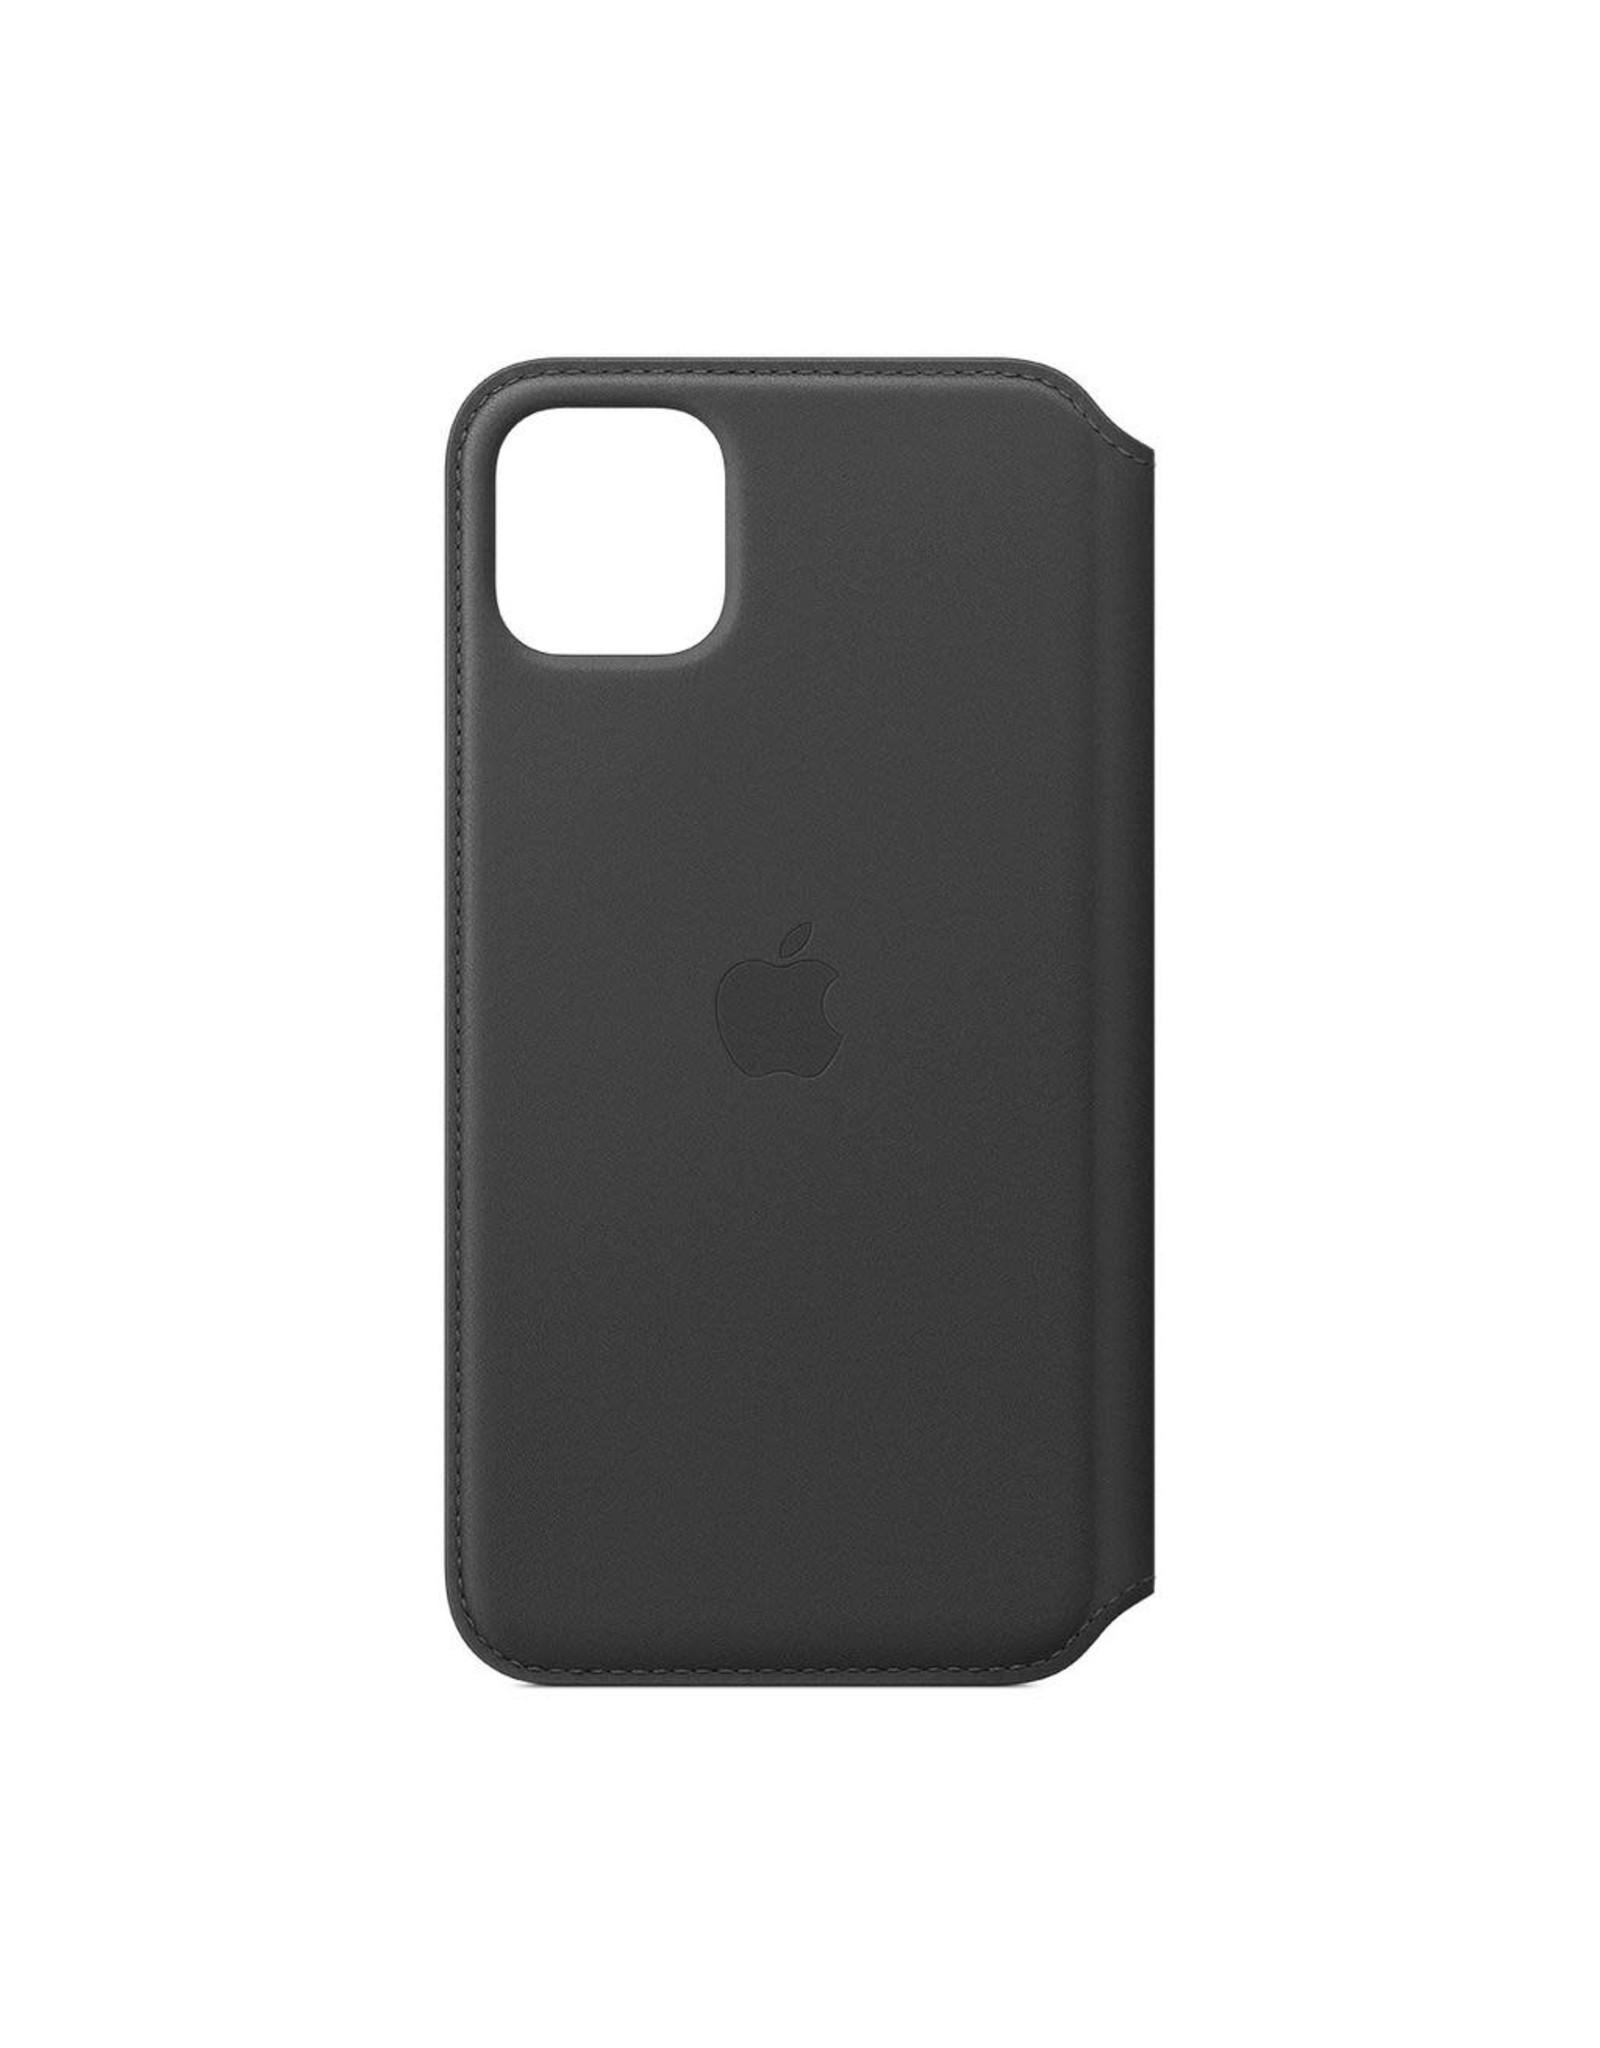 Apple Apple iPhone 11 Pro Max Leather Folio - BLACK